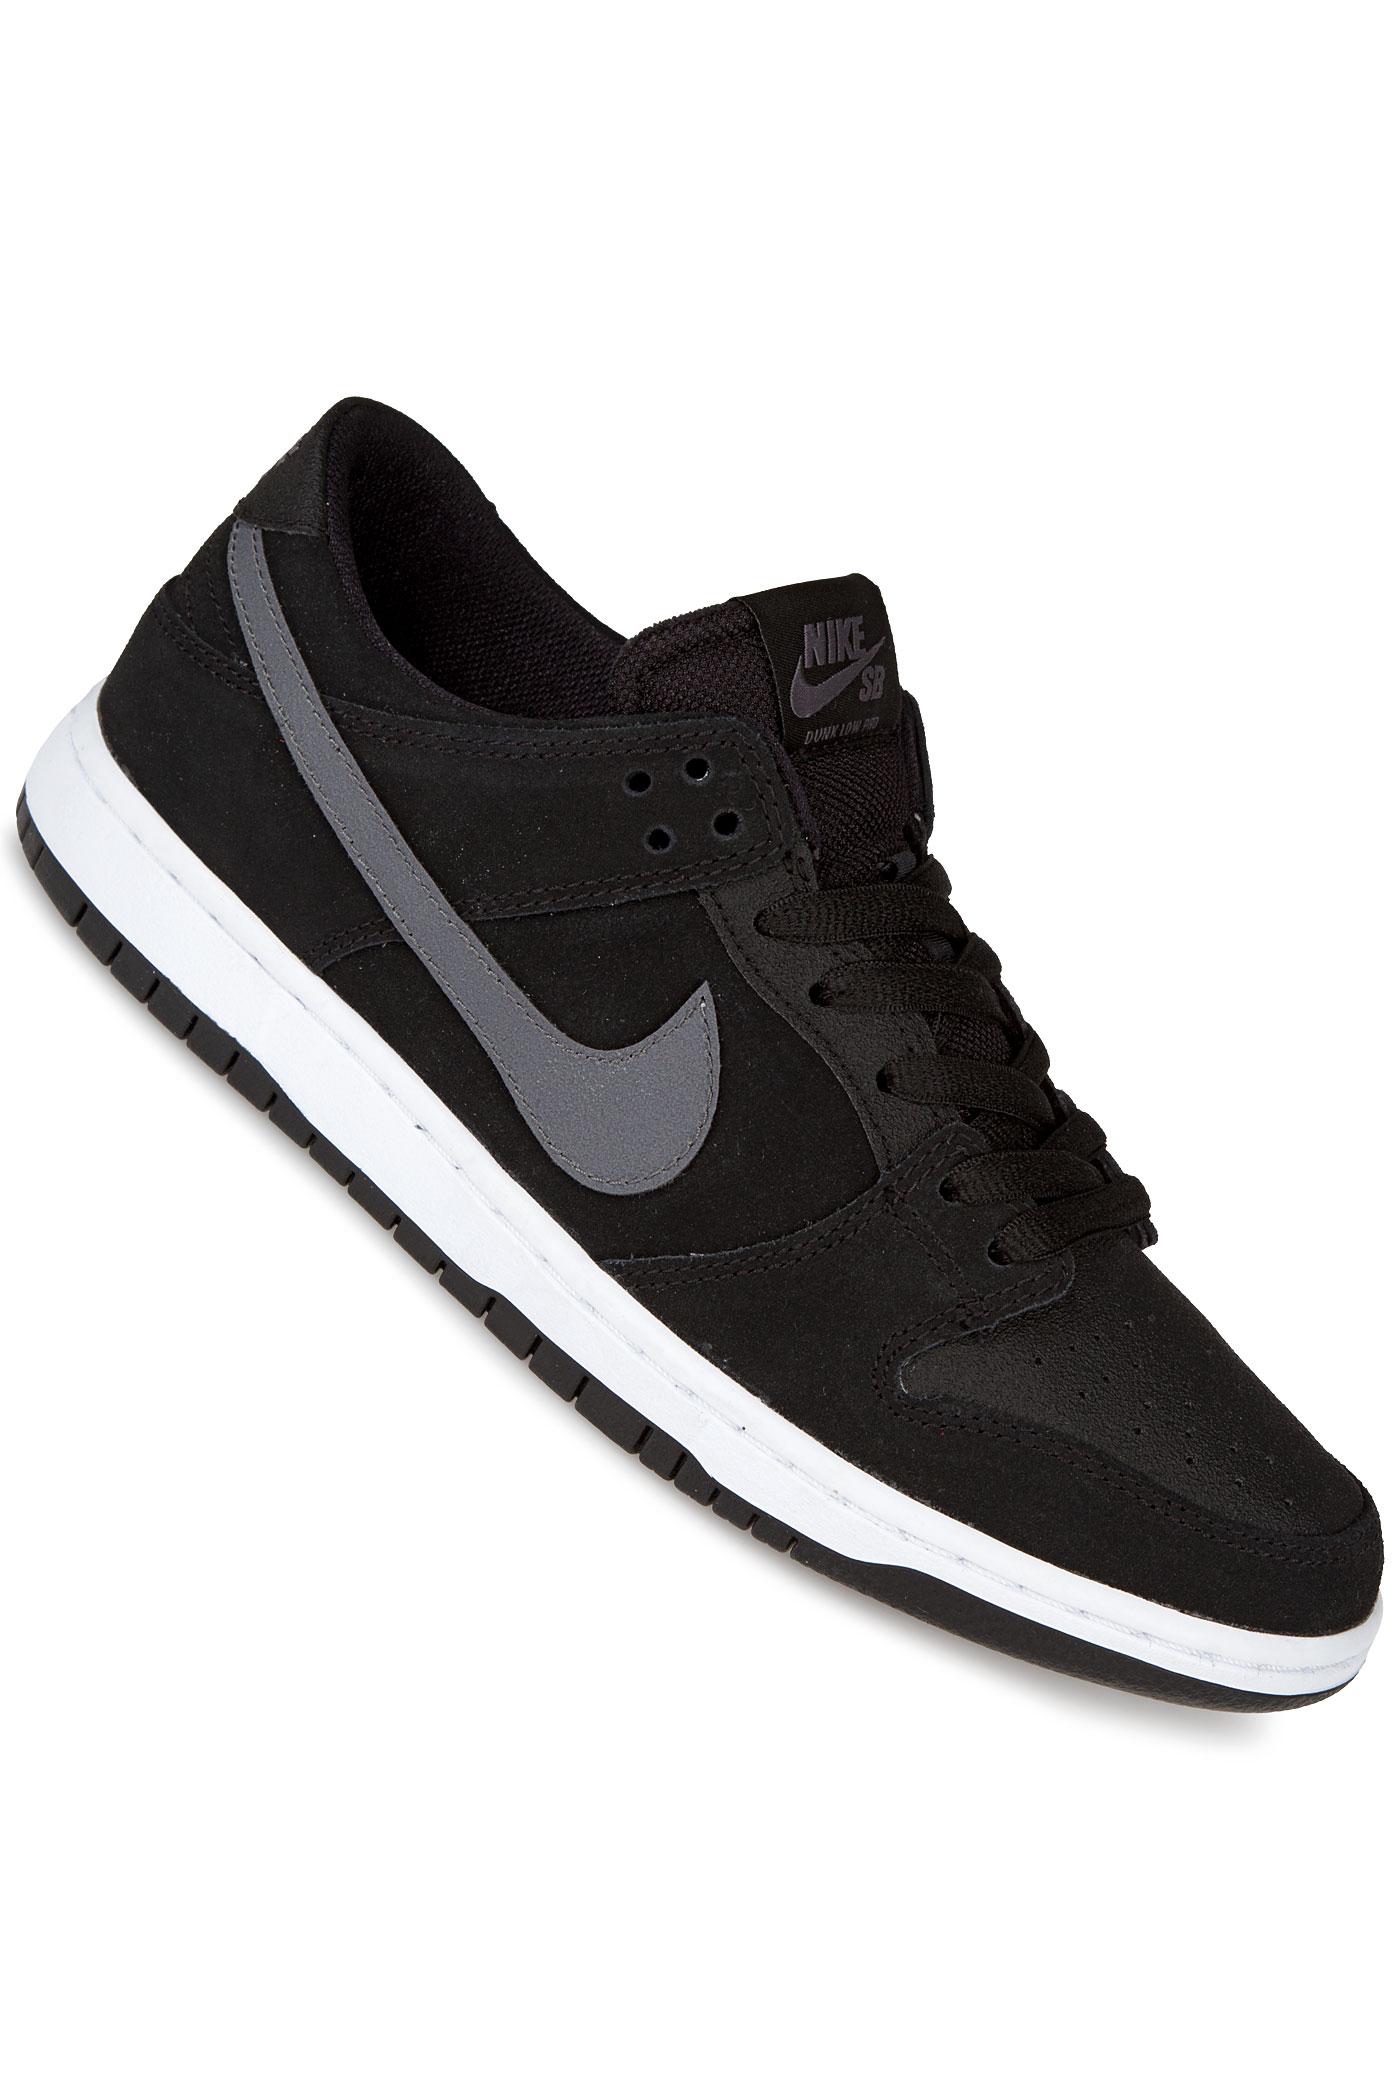 nike sb dunk low pro ishod wair chaussure black white light graphite achetez sur skatedeluxe. Black Bedroom Furniture Sets. Home Design Ideas